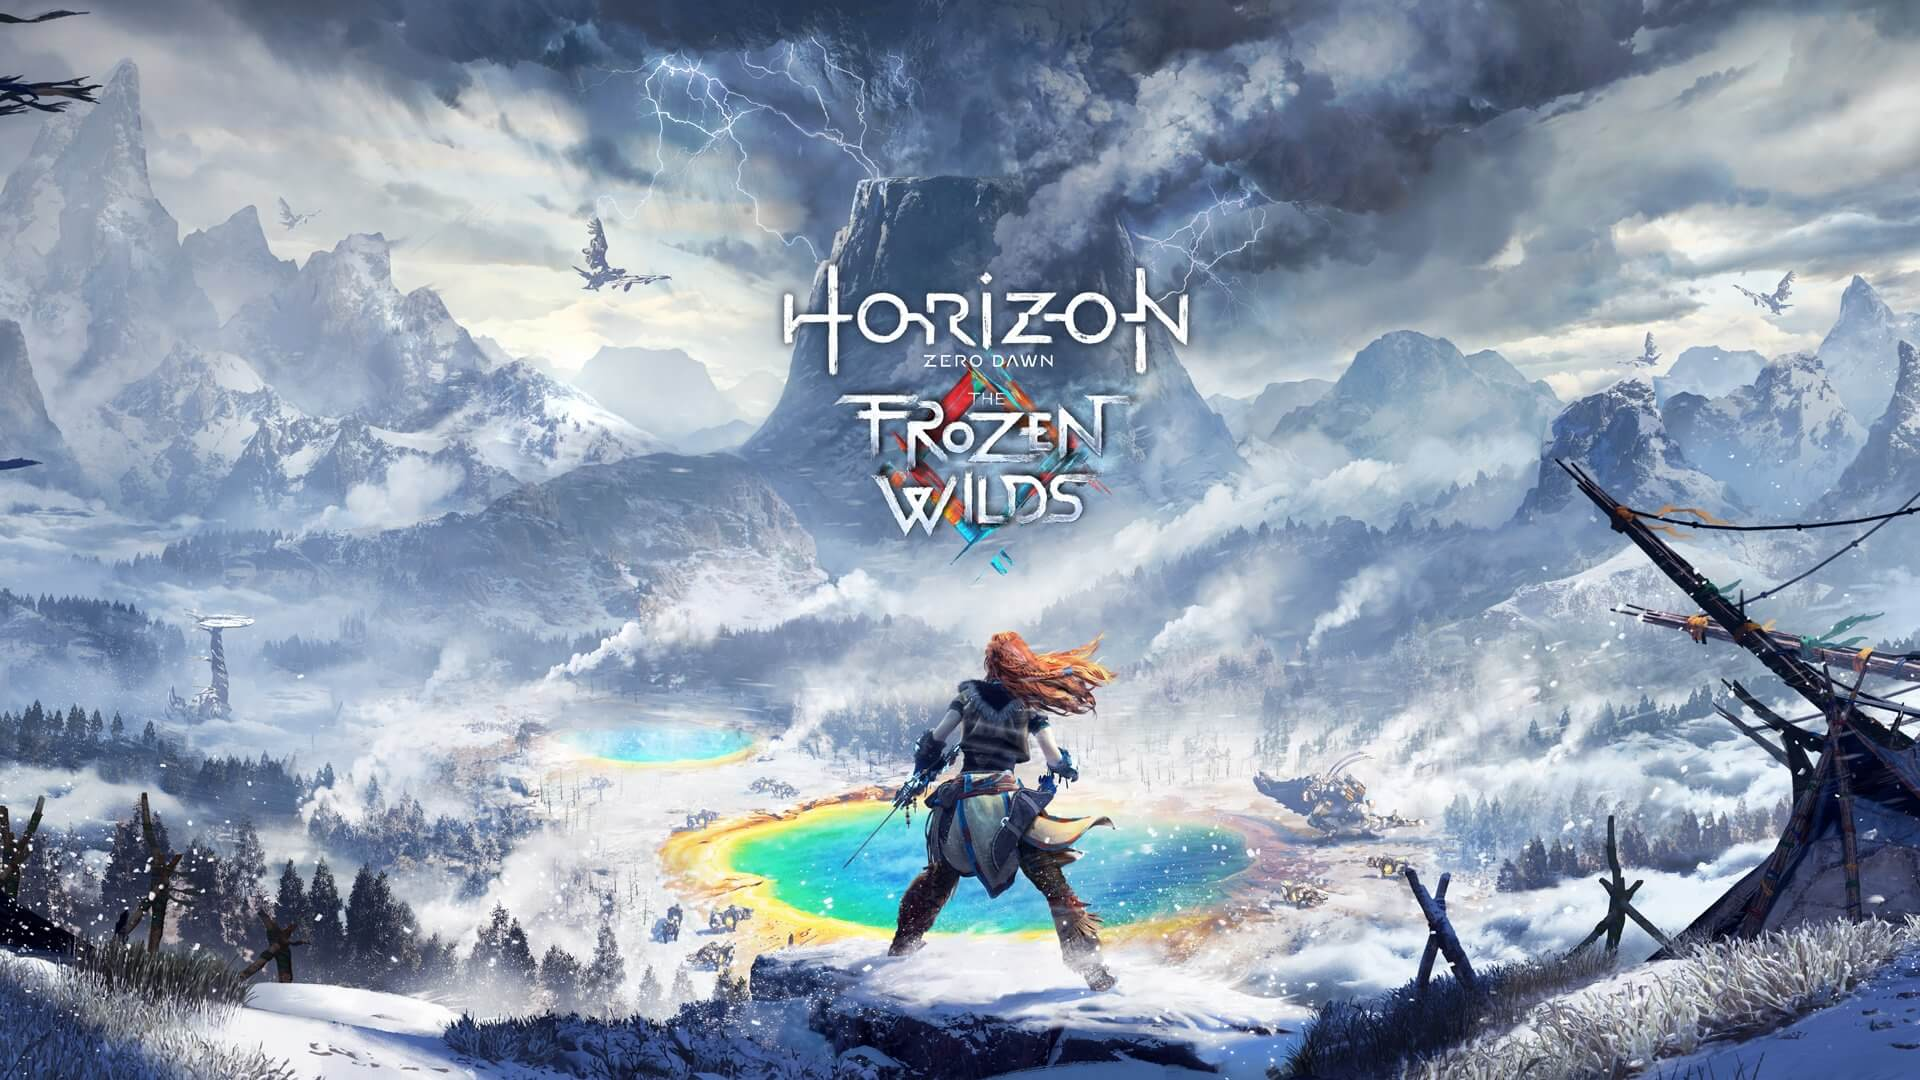 Обзор дополнения The Frozen Wilds для игры Horizon Zero Dawn